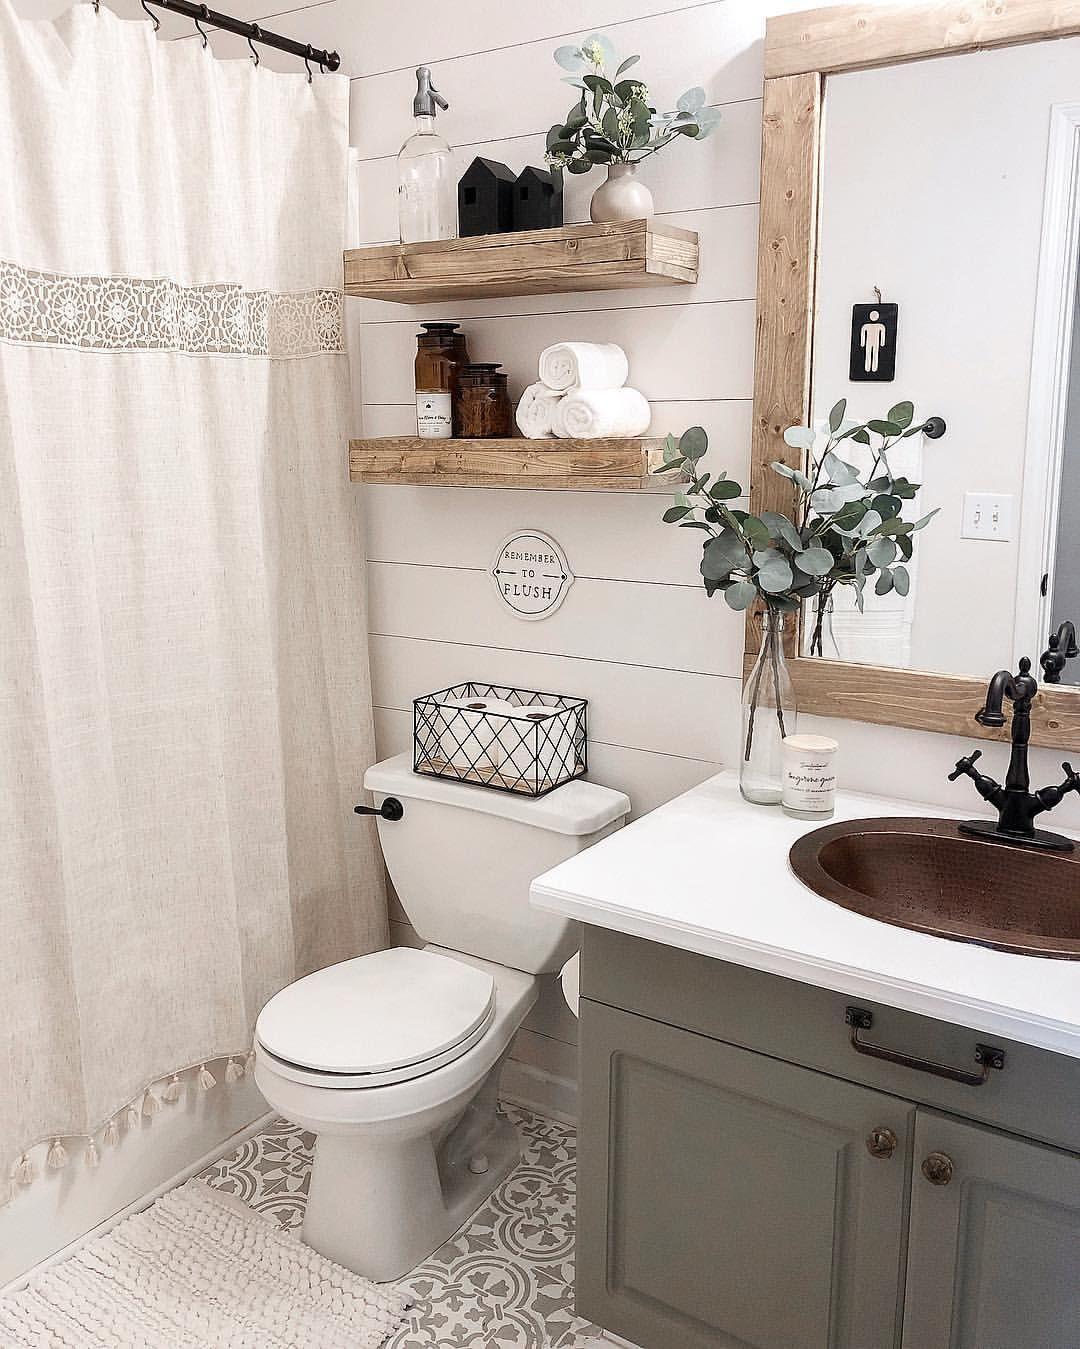 Copper Sink Bathroom Framed Bathroom Mirror Painted Bathroom